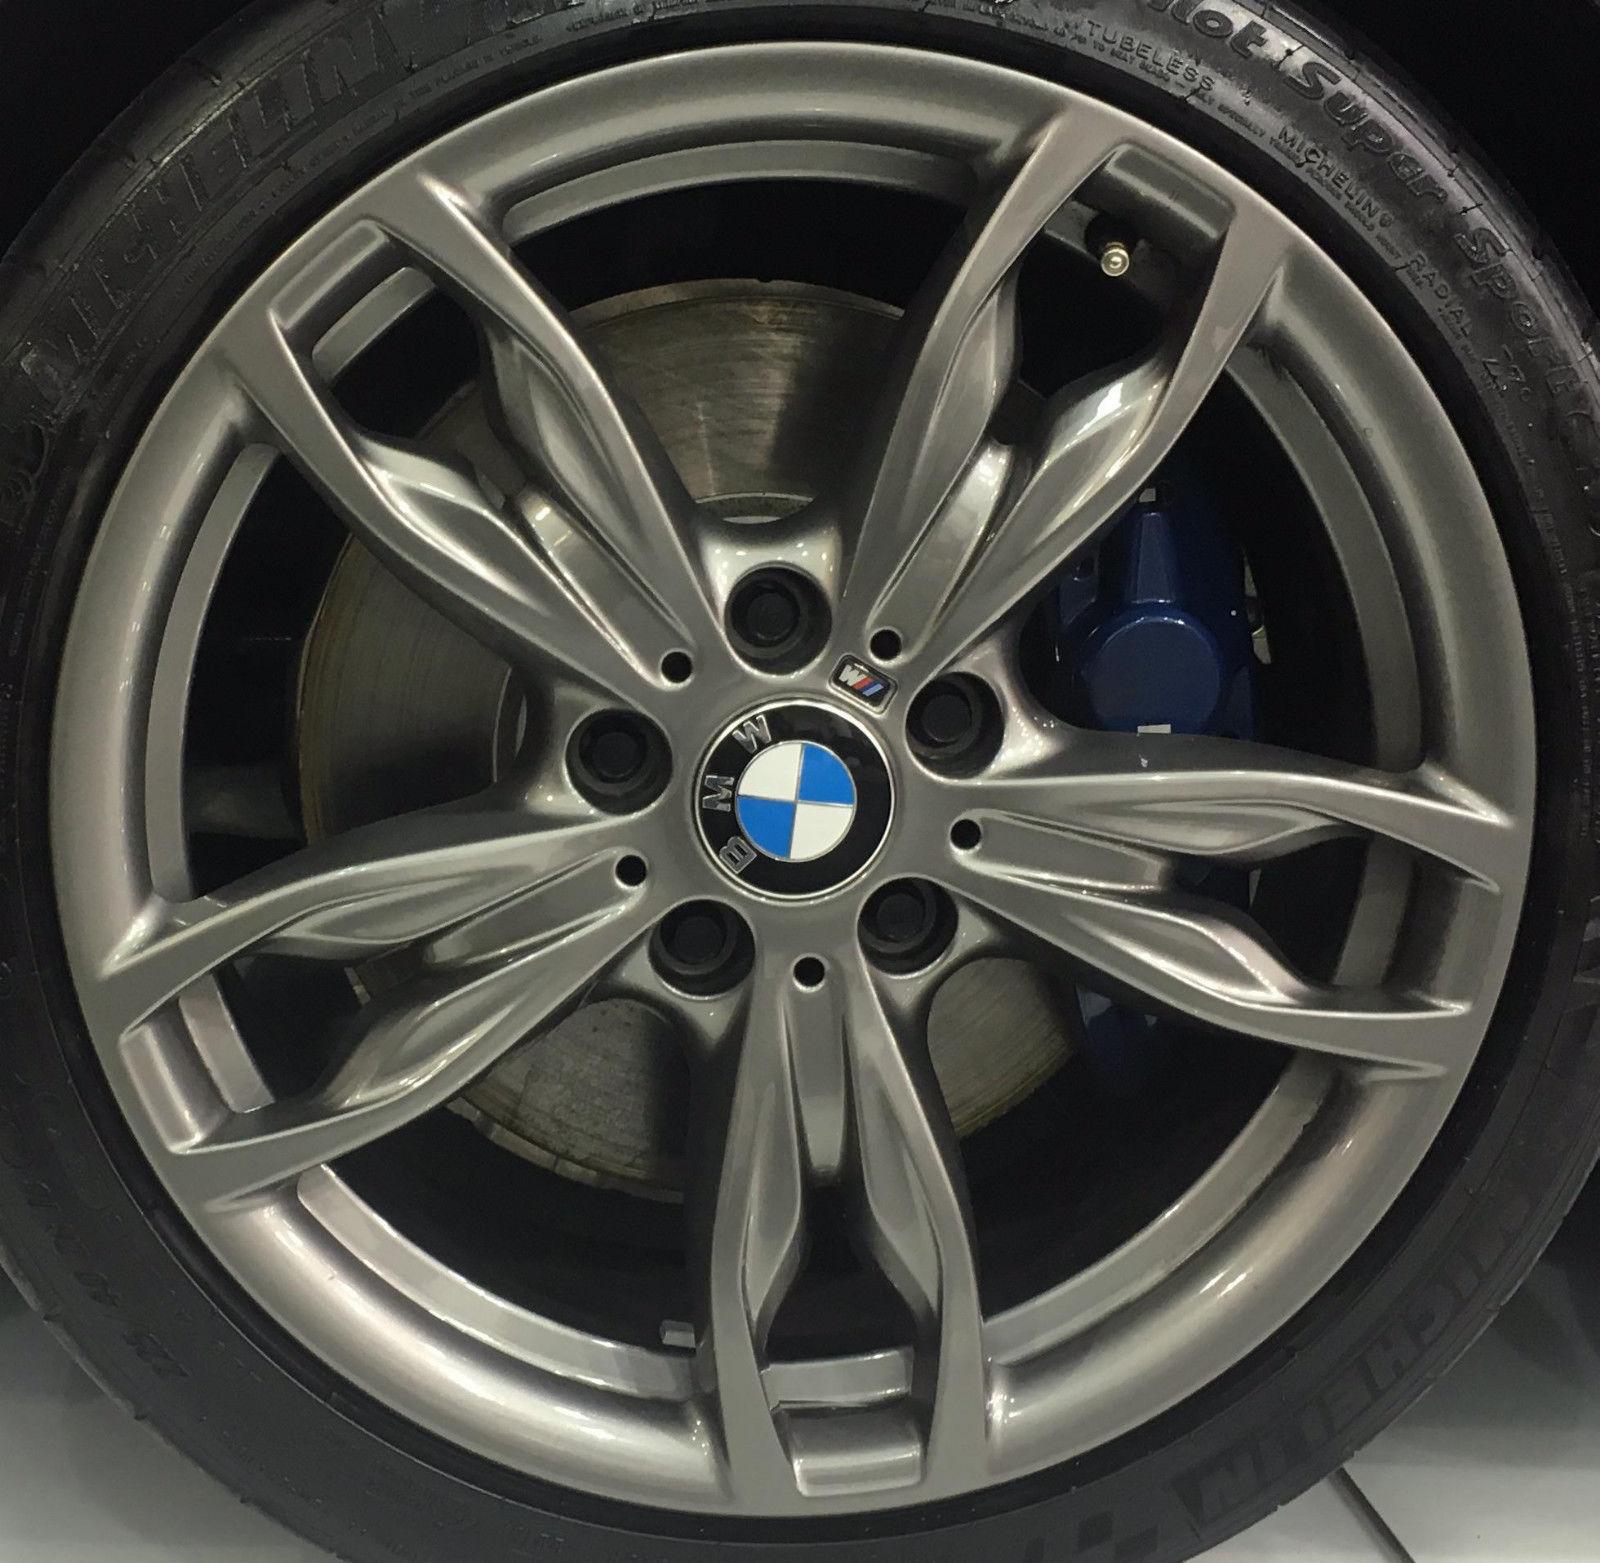 Bmw M5 F10 >> BMW FERRIC GREY METALLIC (24-00-16) [WP-24-00-16] - £15.51 : Wheel Paints